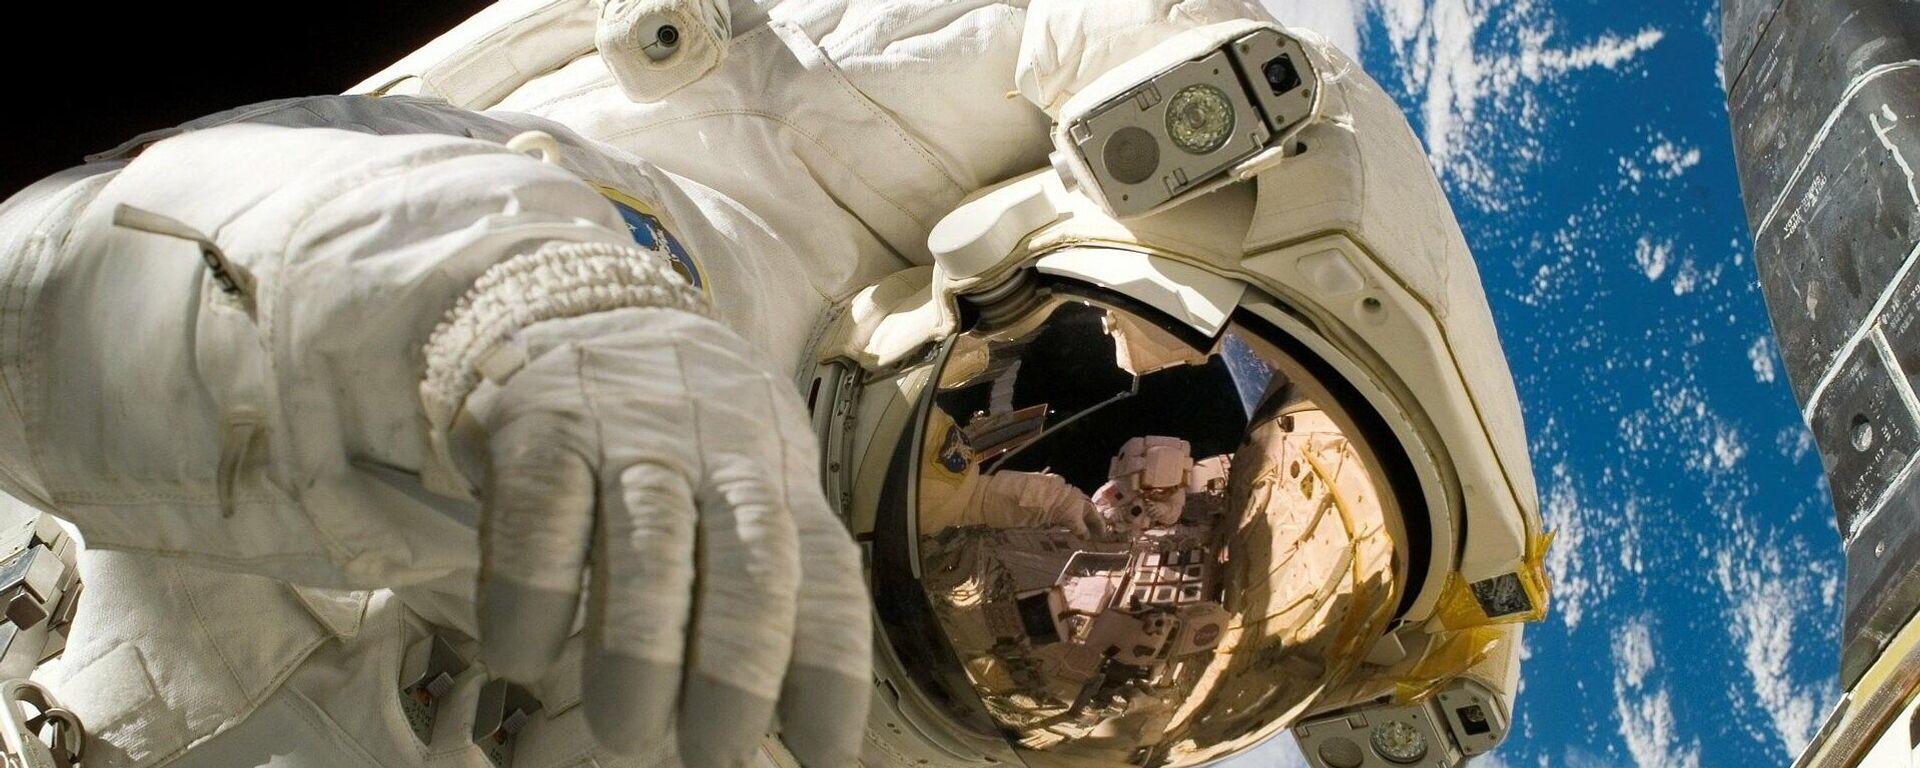 Un astronauta, imagen referencial - Sputnik Mundo, 1920, 05.03.2021